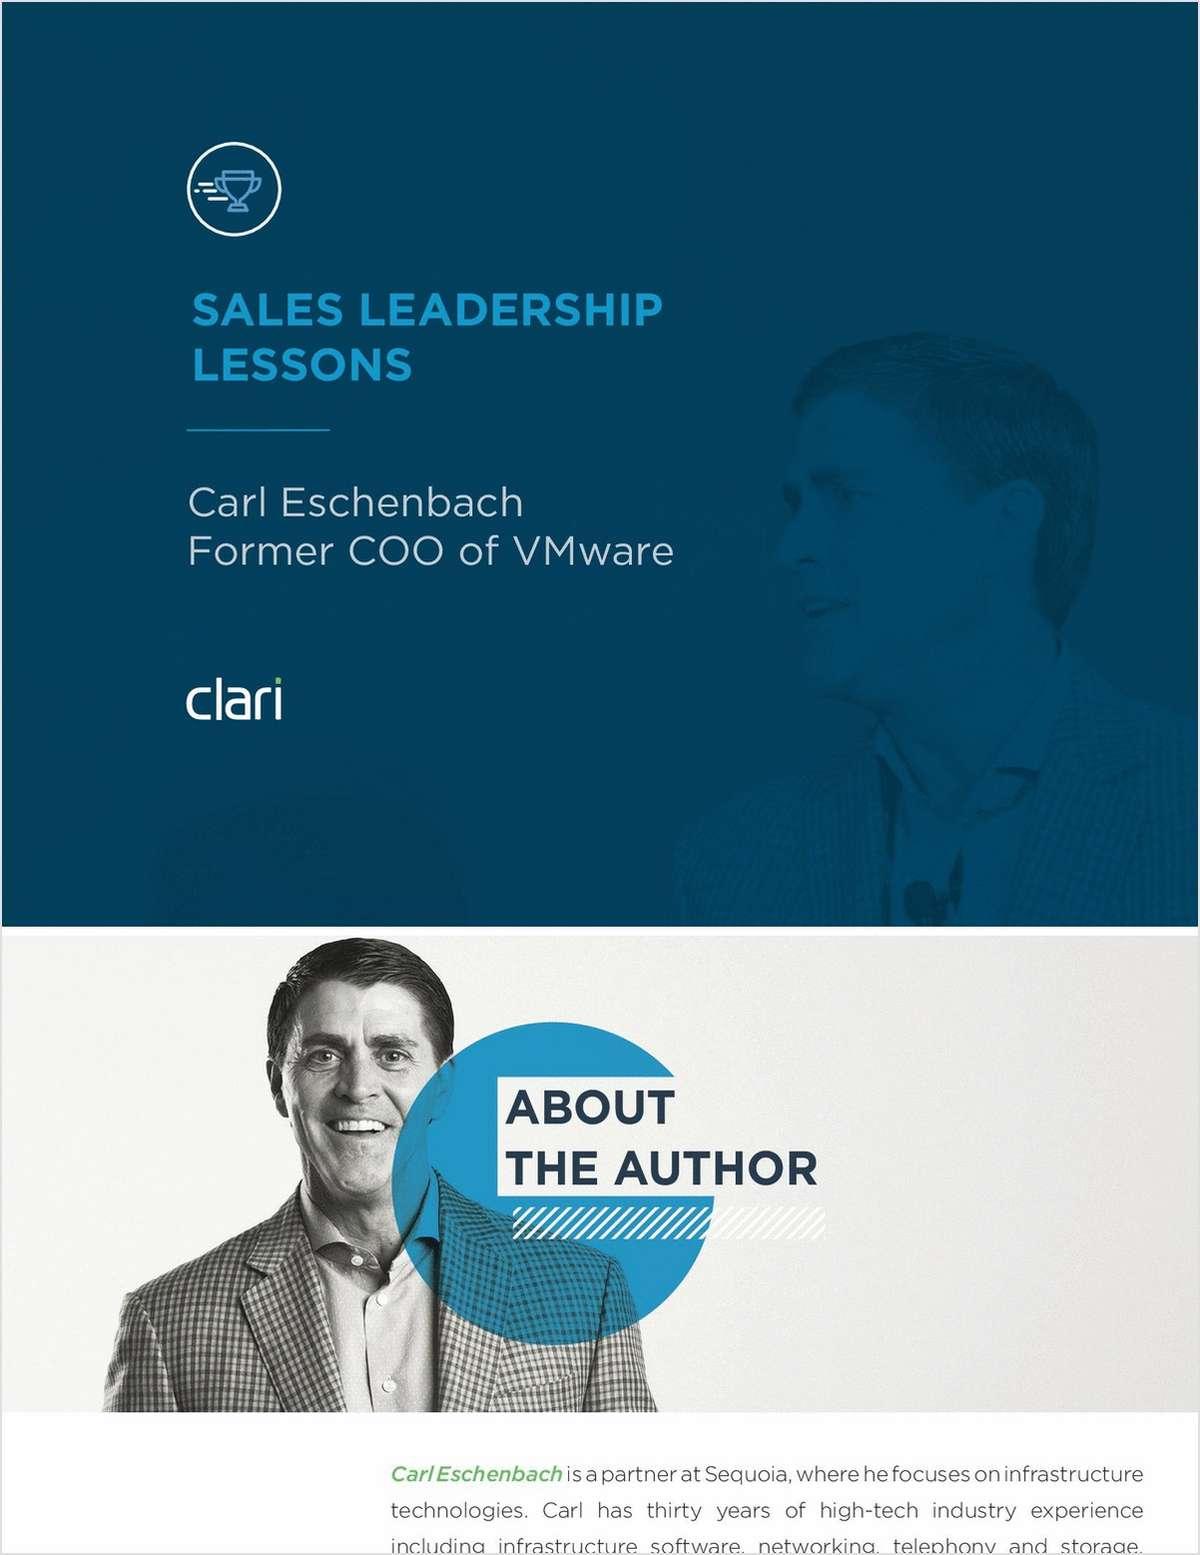 Sales Leadership Lessons